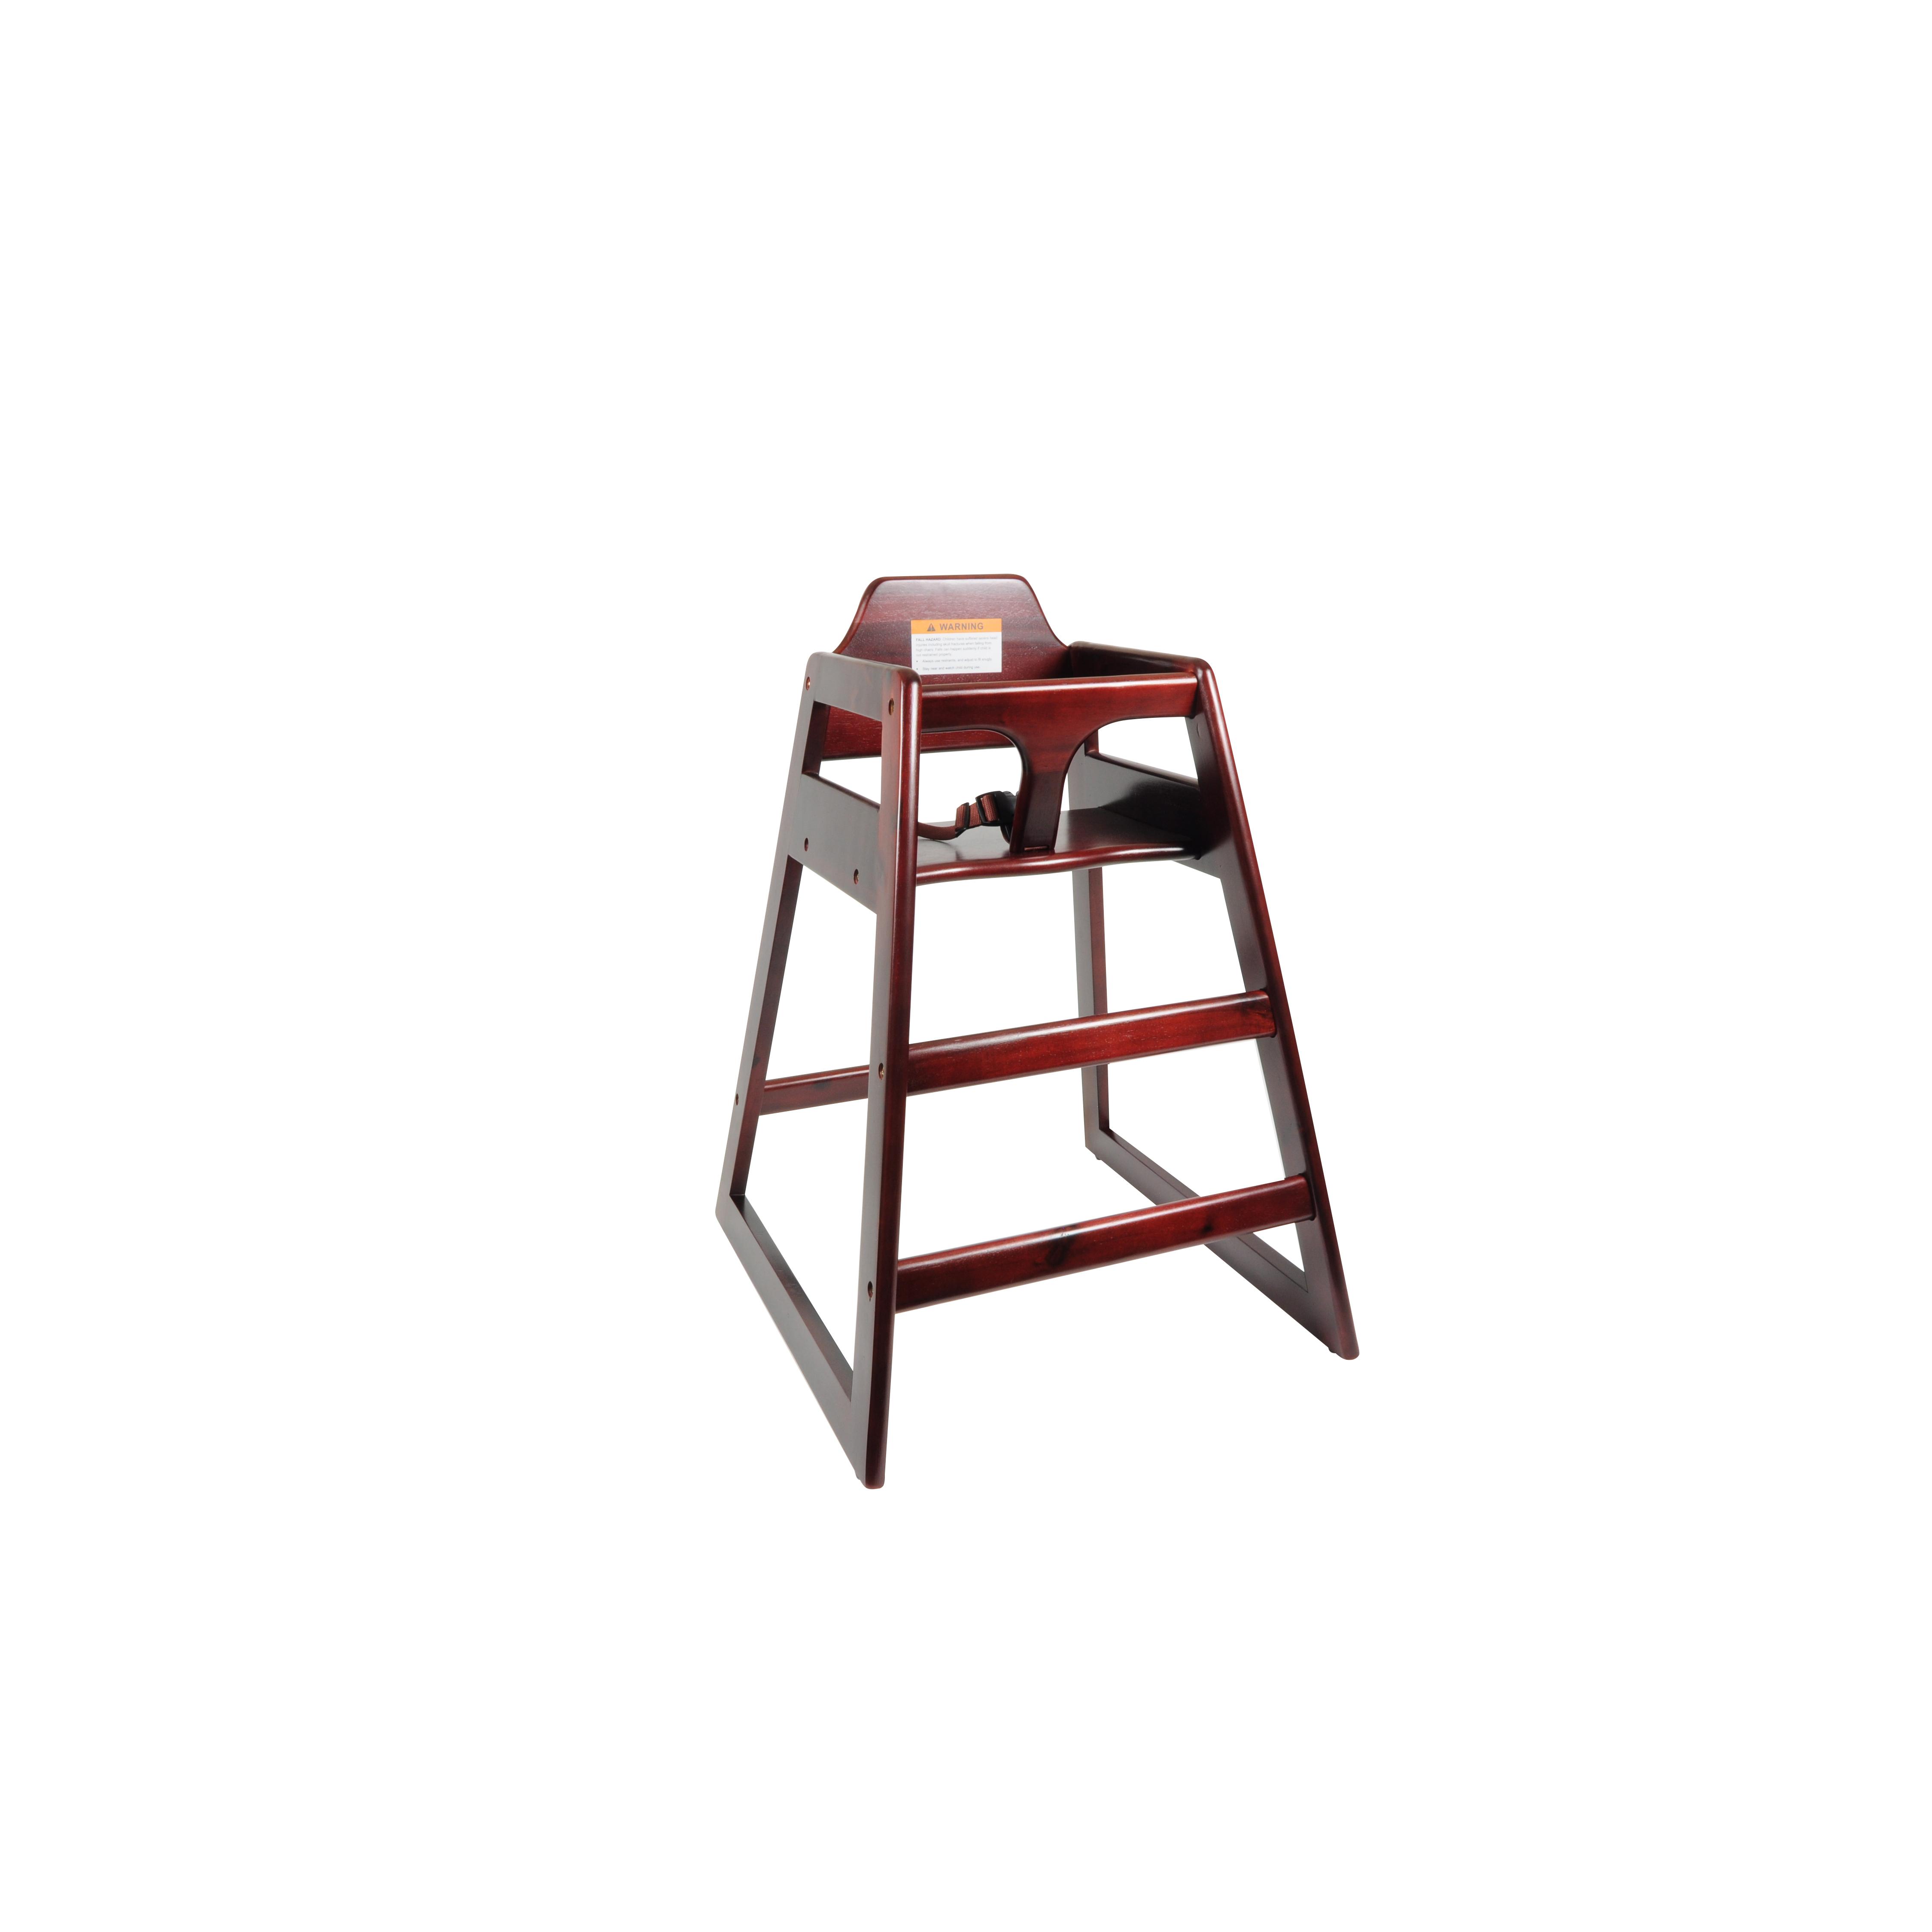 Thunder Group WDTHHC020A high chair, wood